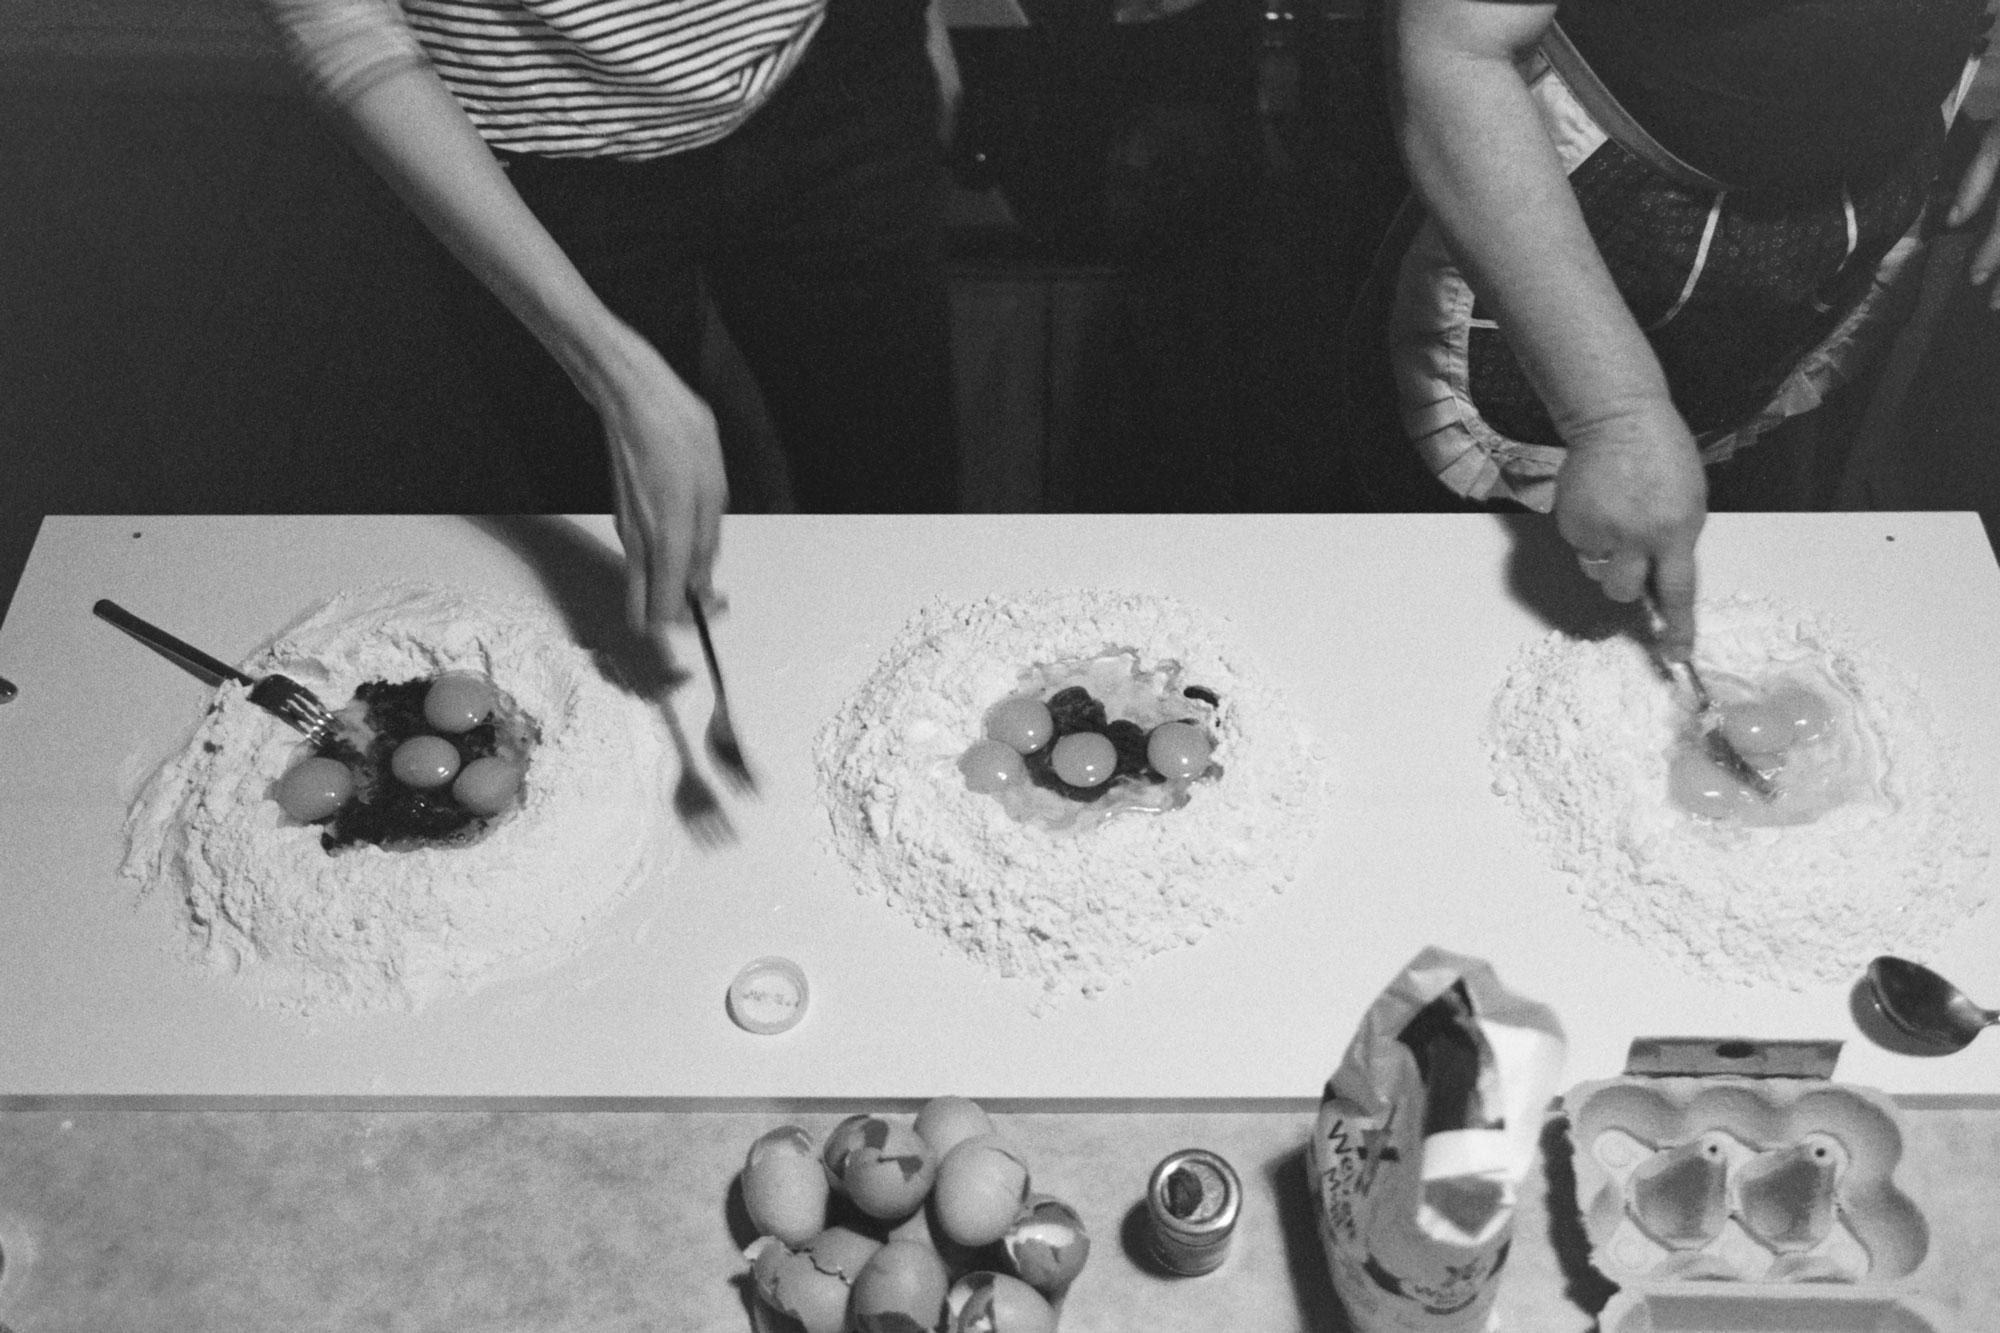 Tortelli workshop preparing doughh